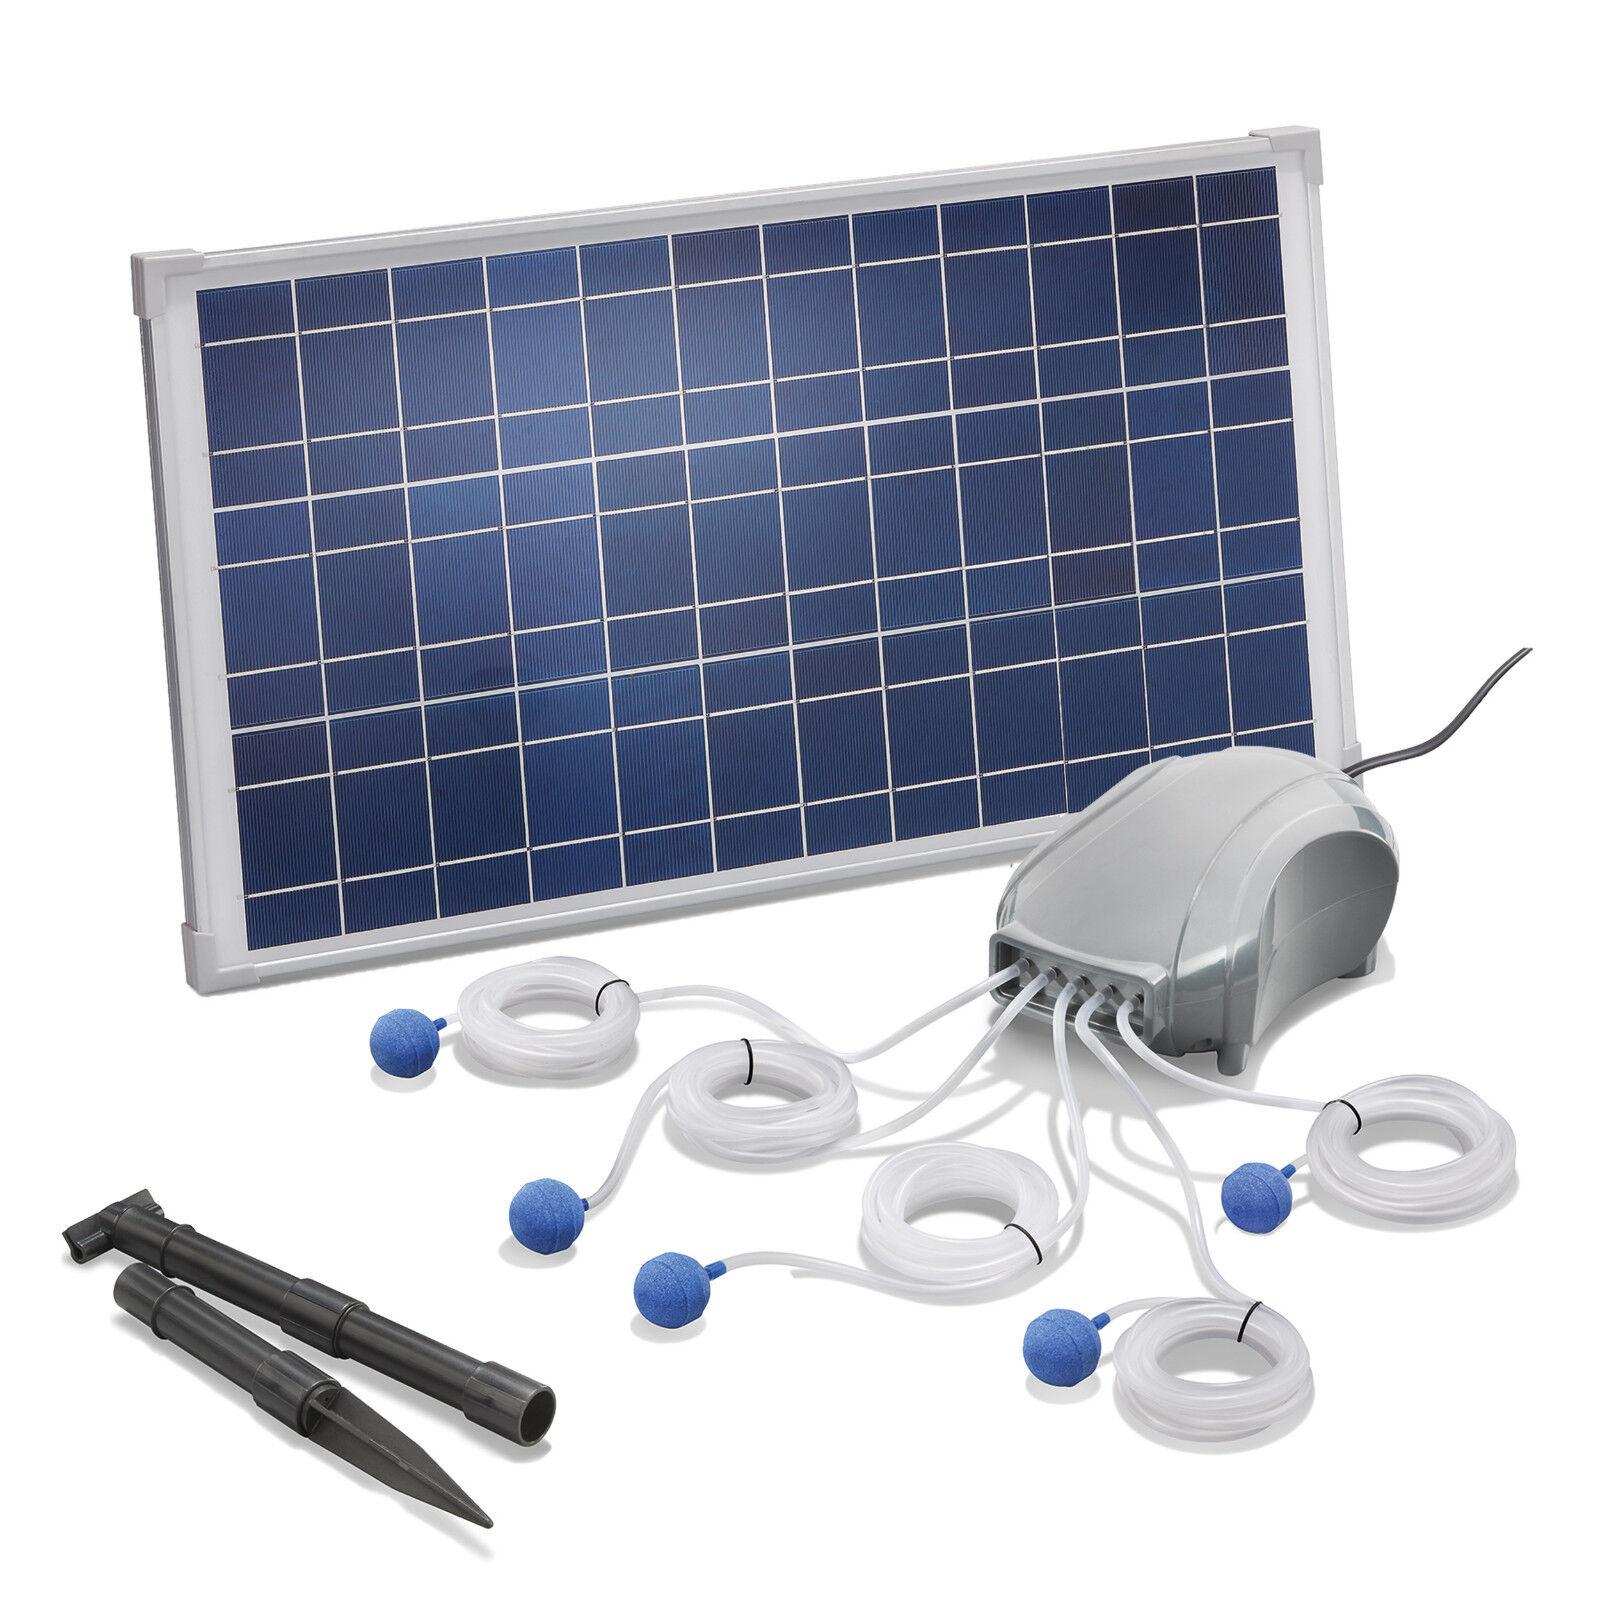 solar ersatzpumpe teichbel fter 6 9v sauerstoff teich. Black Bedroom Furniture Sets. Home Design Ideas